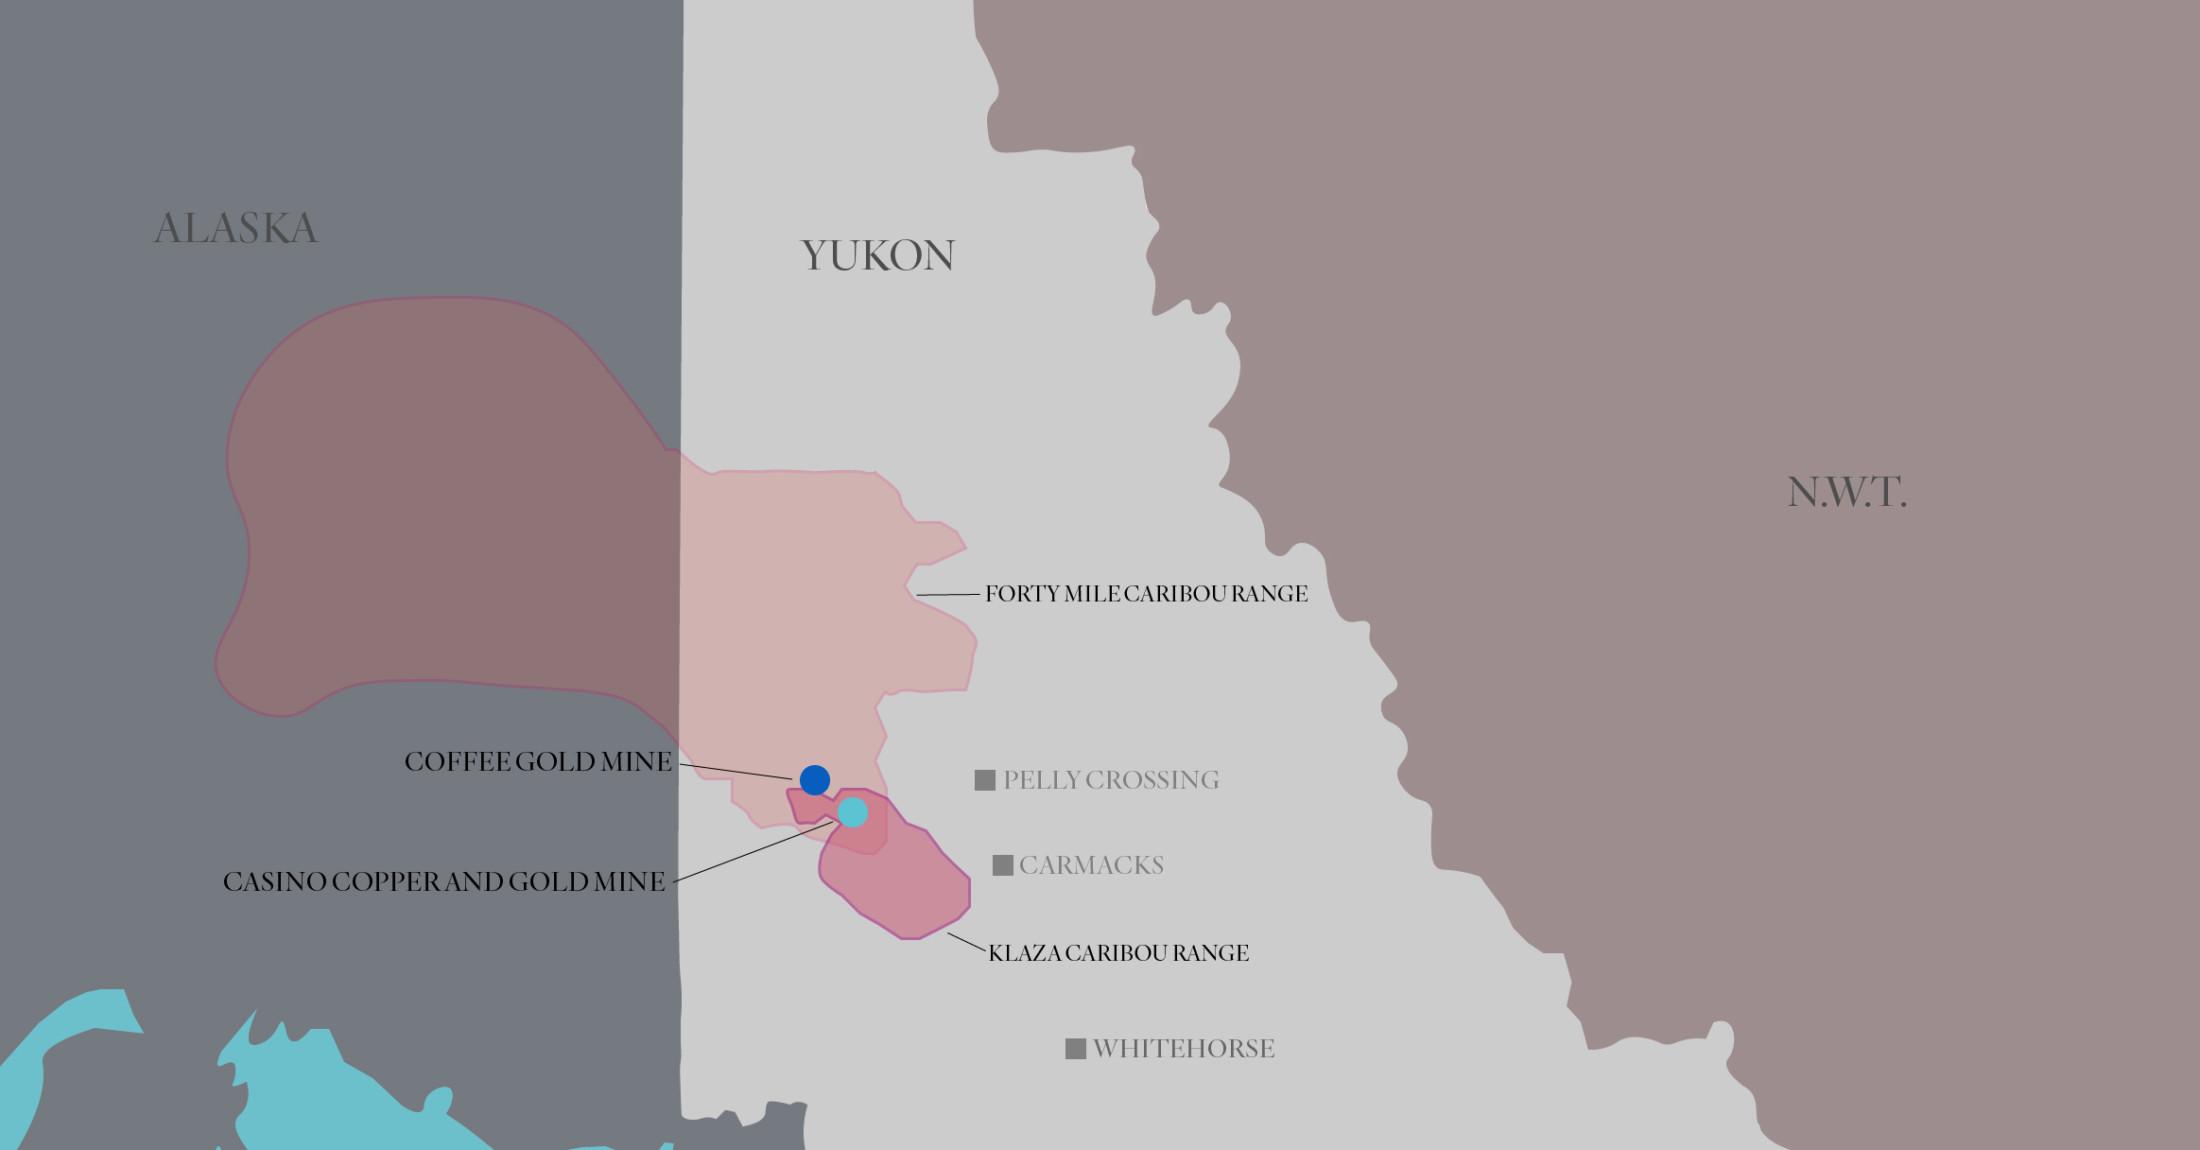 Yukon Casino and Coffee mines